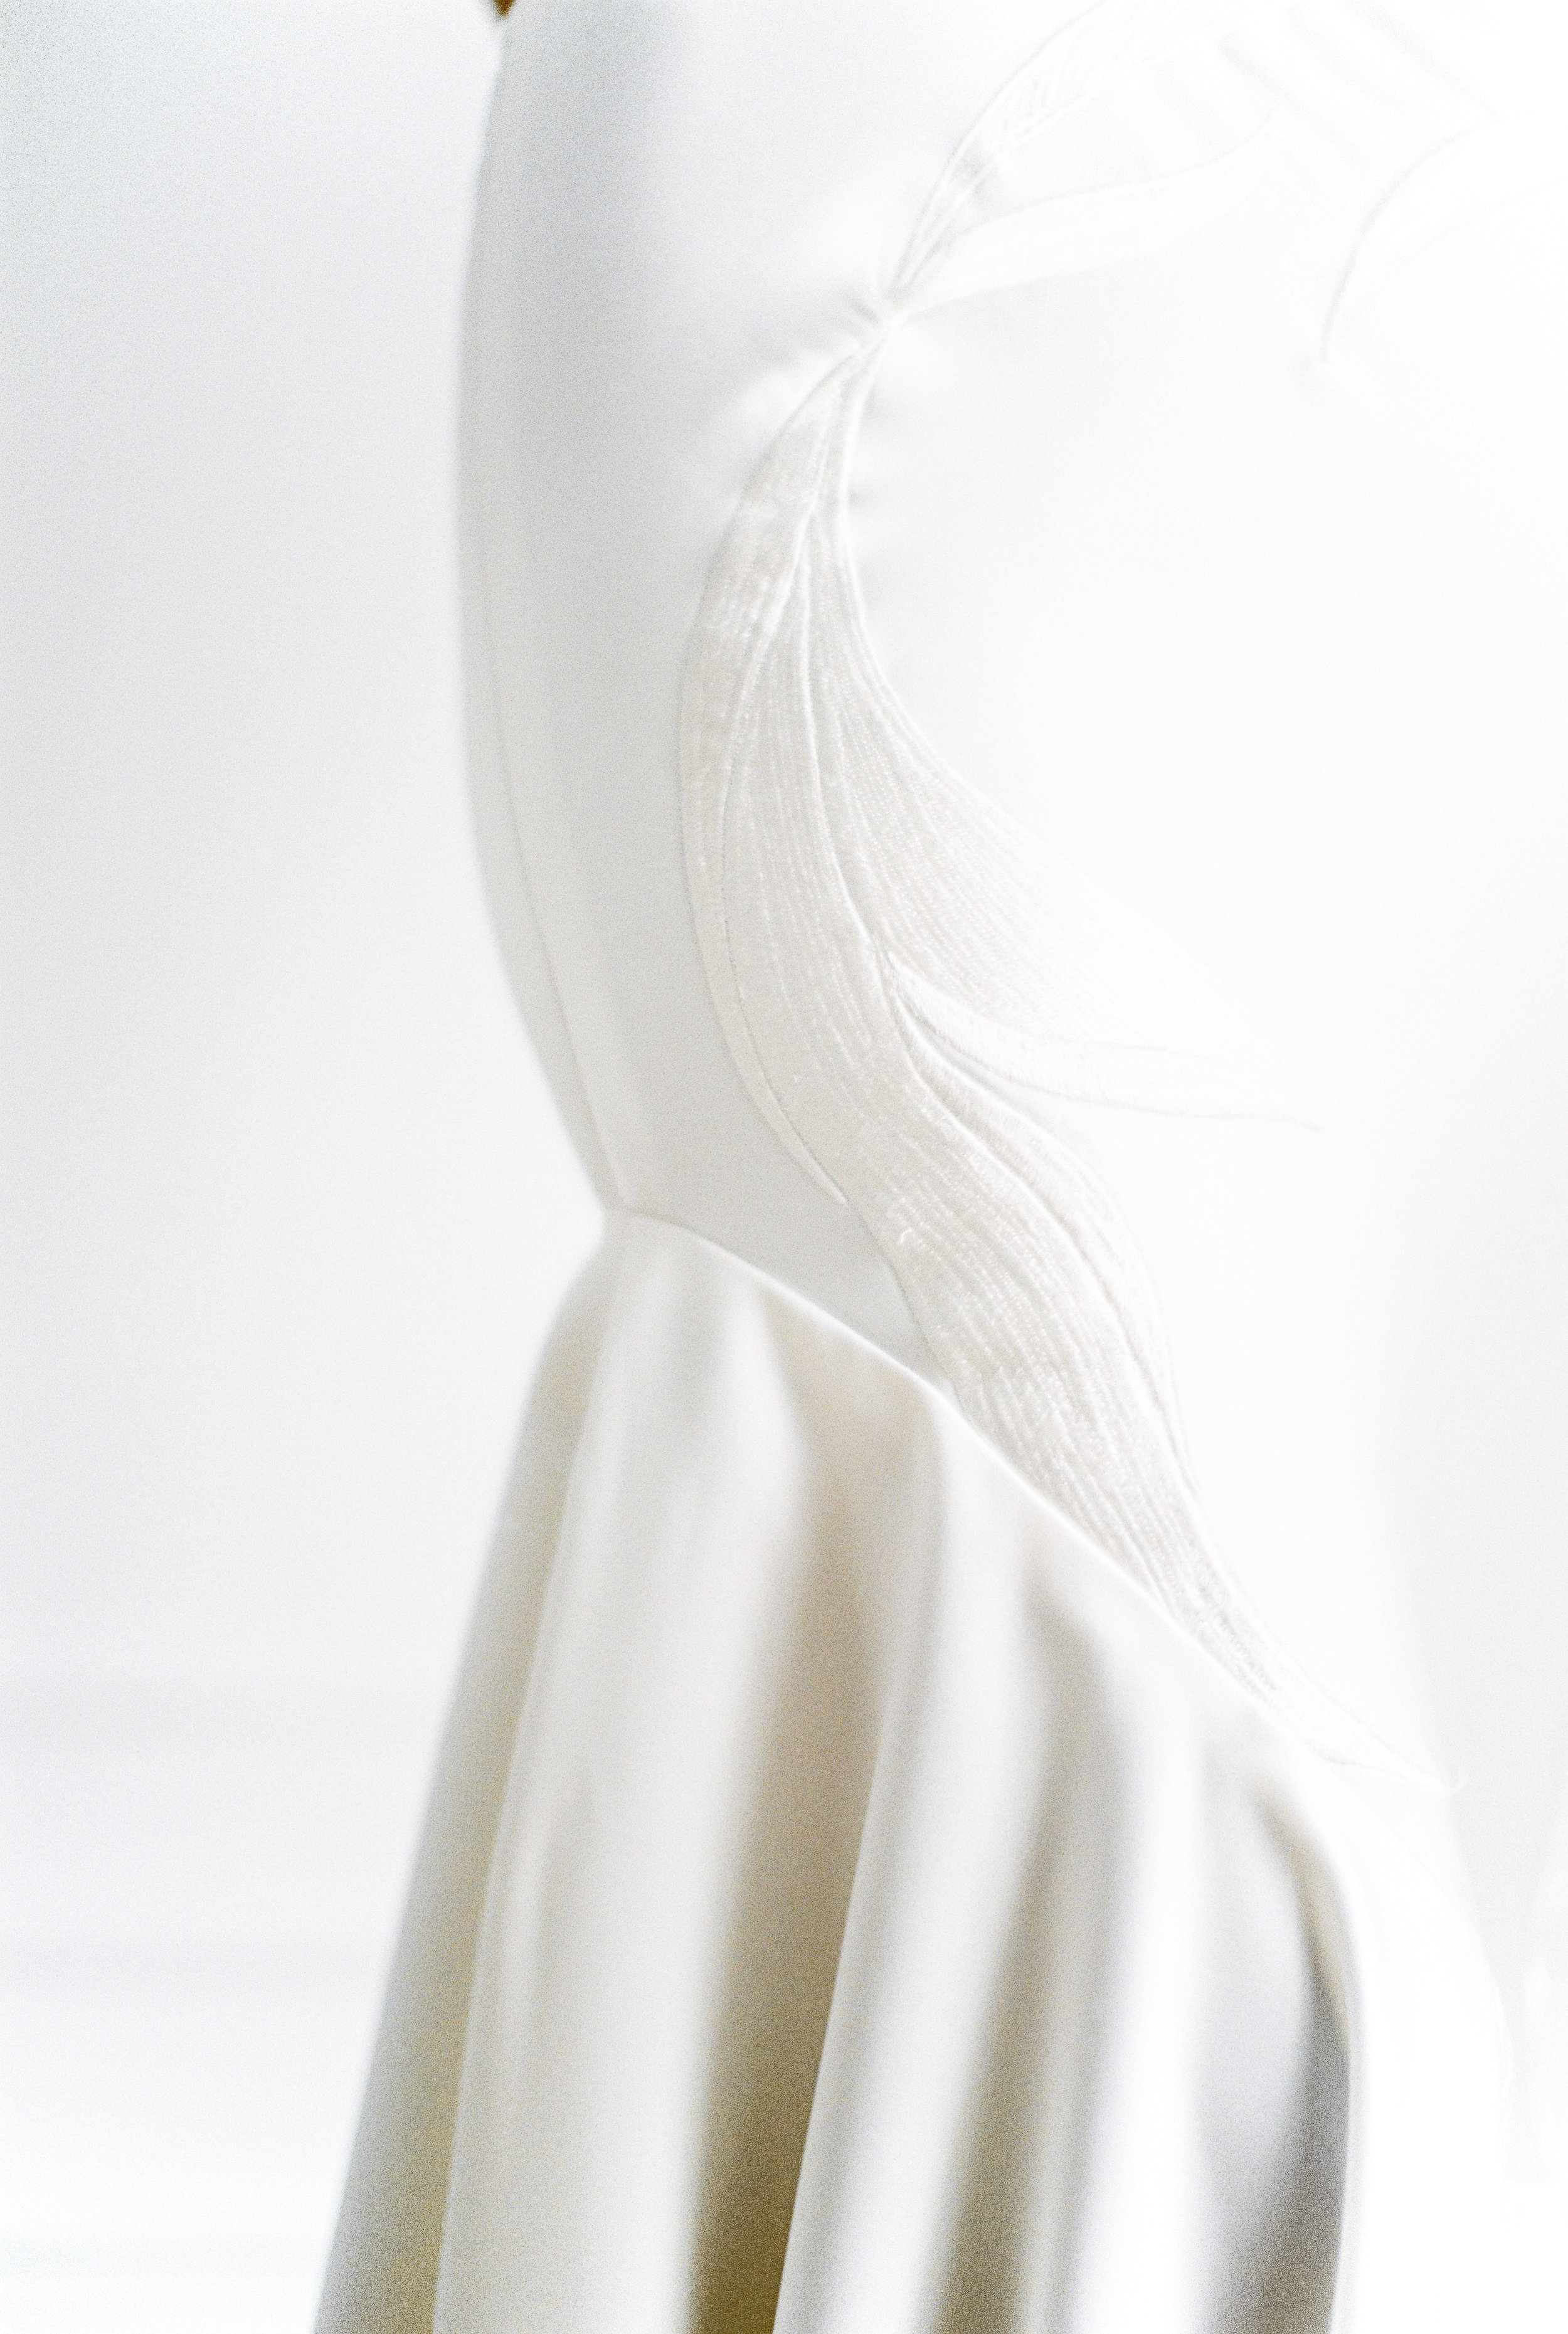 Ludovic Grau-Mingot - Film Photographer - Talitha - Wedding dresses - Collection 2019-58 (1).jpg